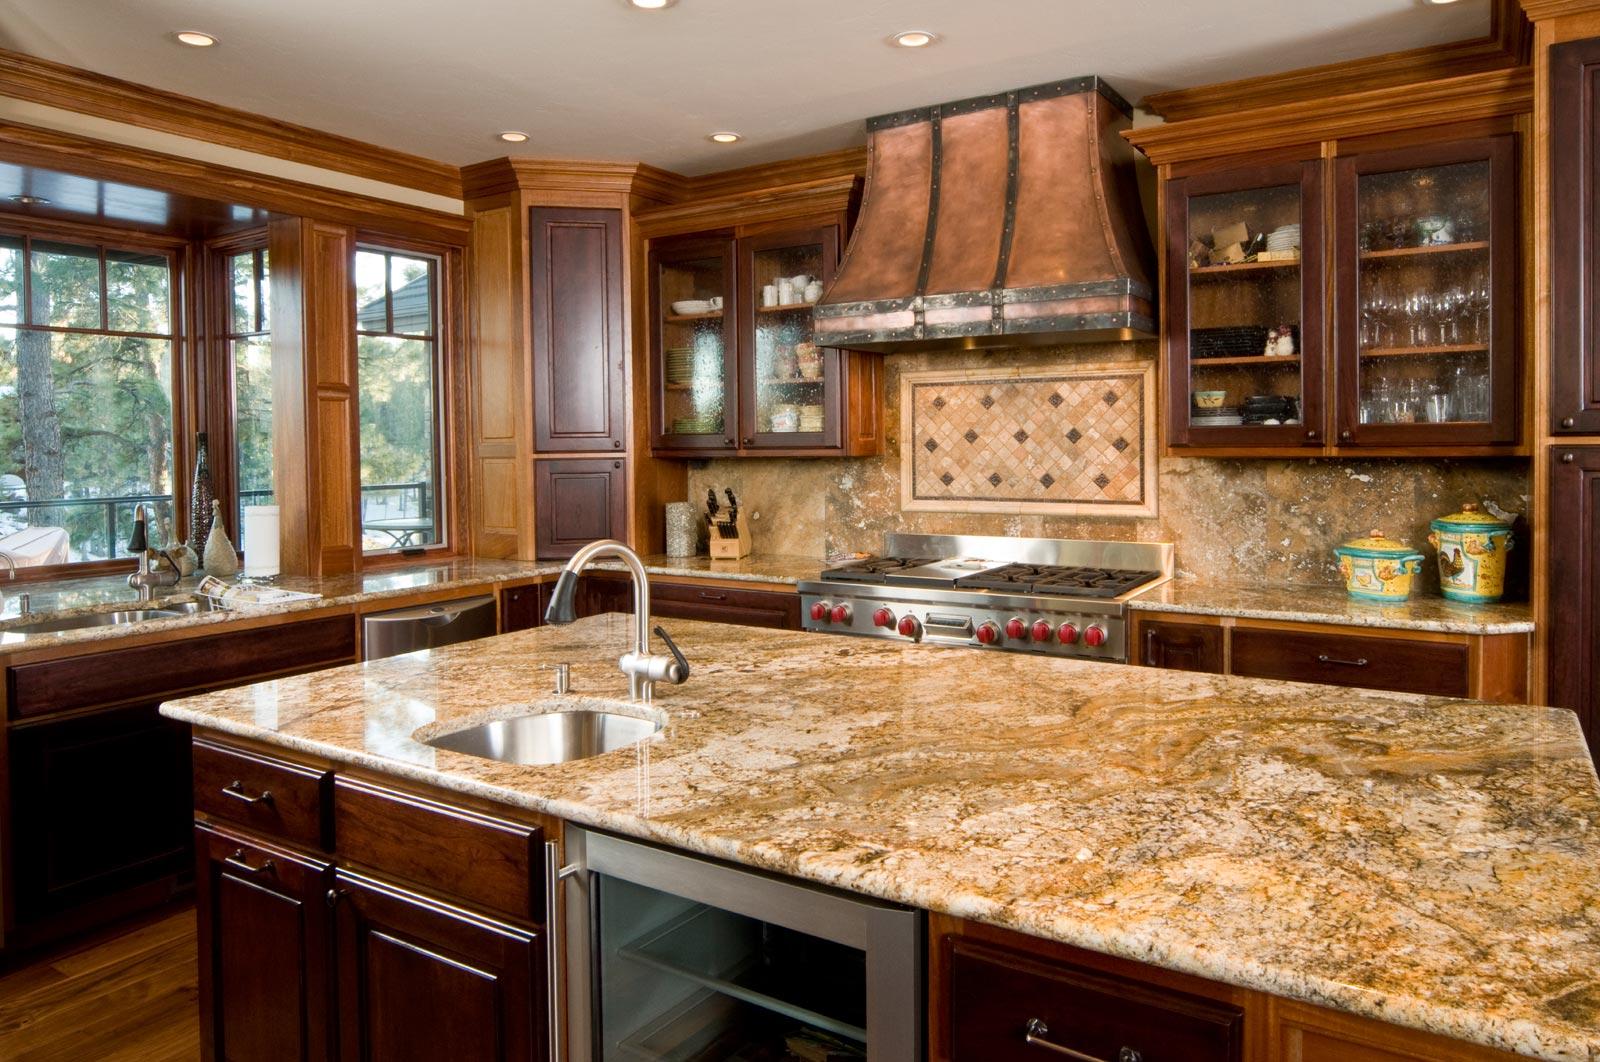 Creamy Orange Kitchen Countertops